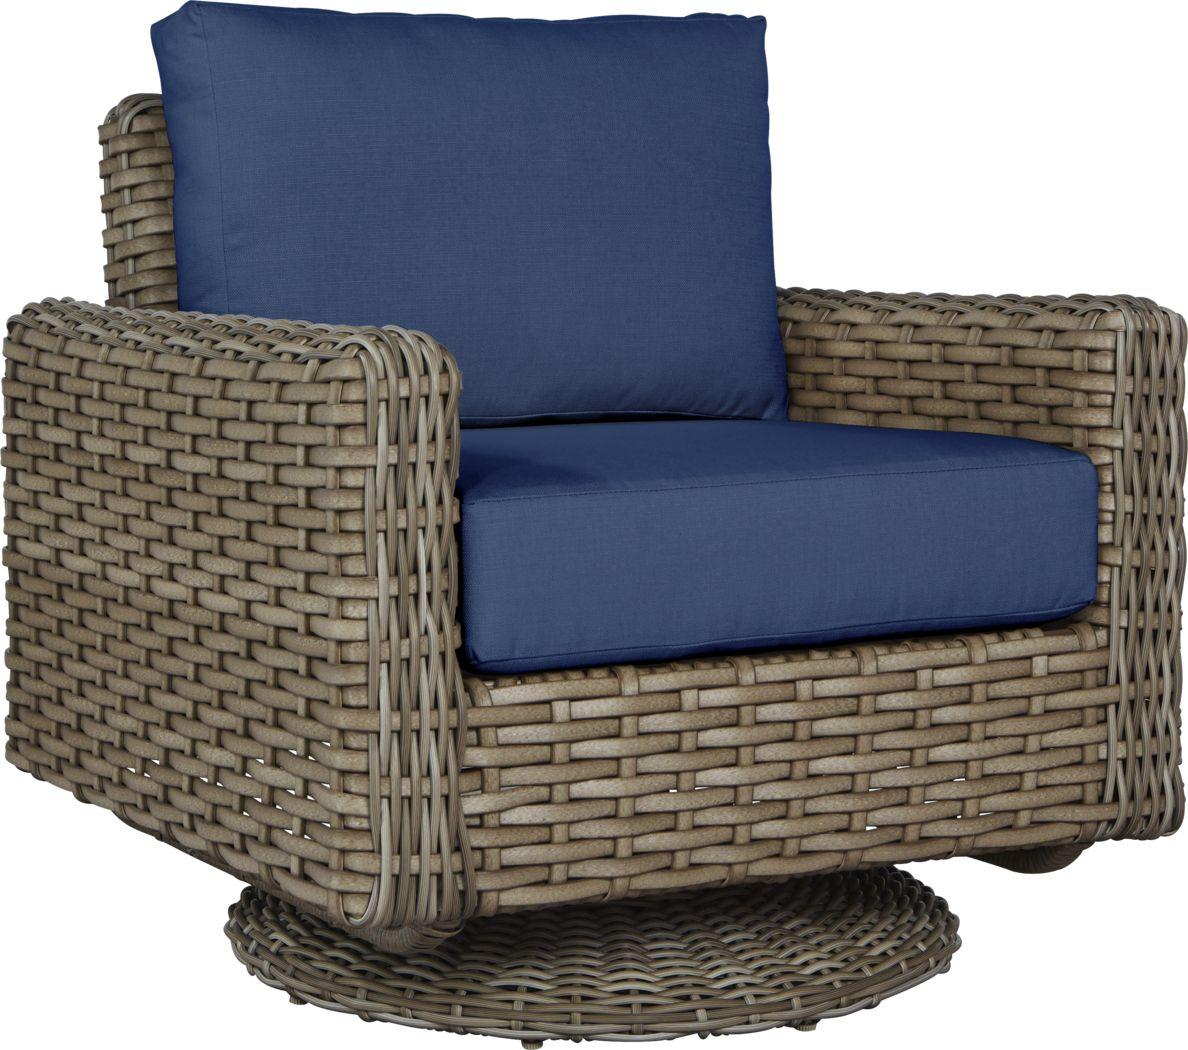 Siesta Key Driftwood Outdoor Swivel Chair with Indigo Cushions